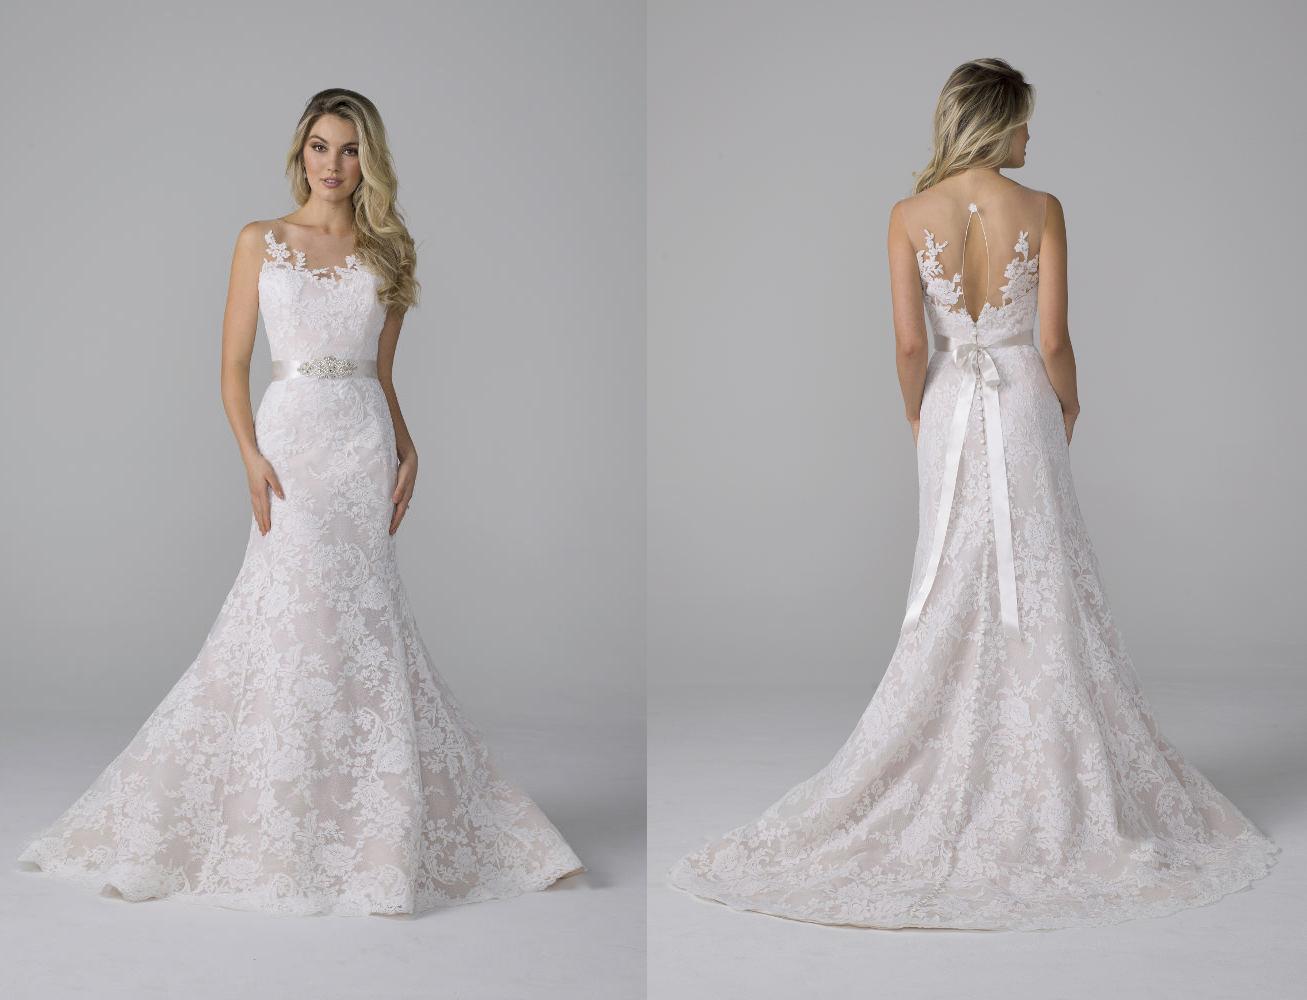 12090f24eae1 trunk shows + events — HAUTE BRIDE™ | San Francisco Bay Area Wedding ...